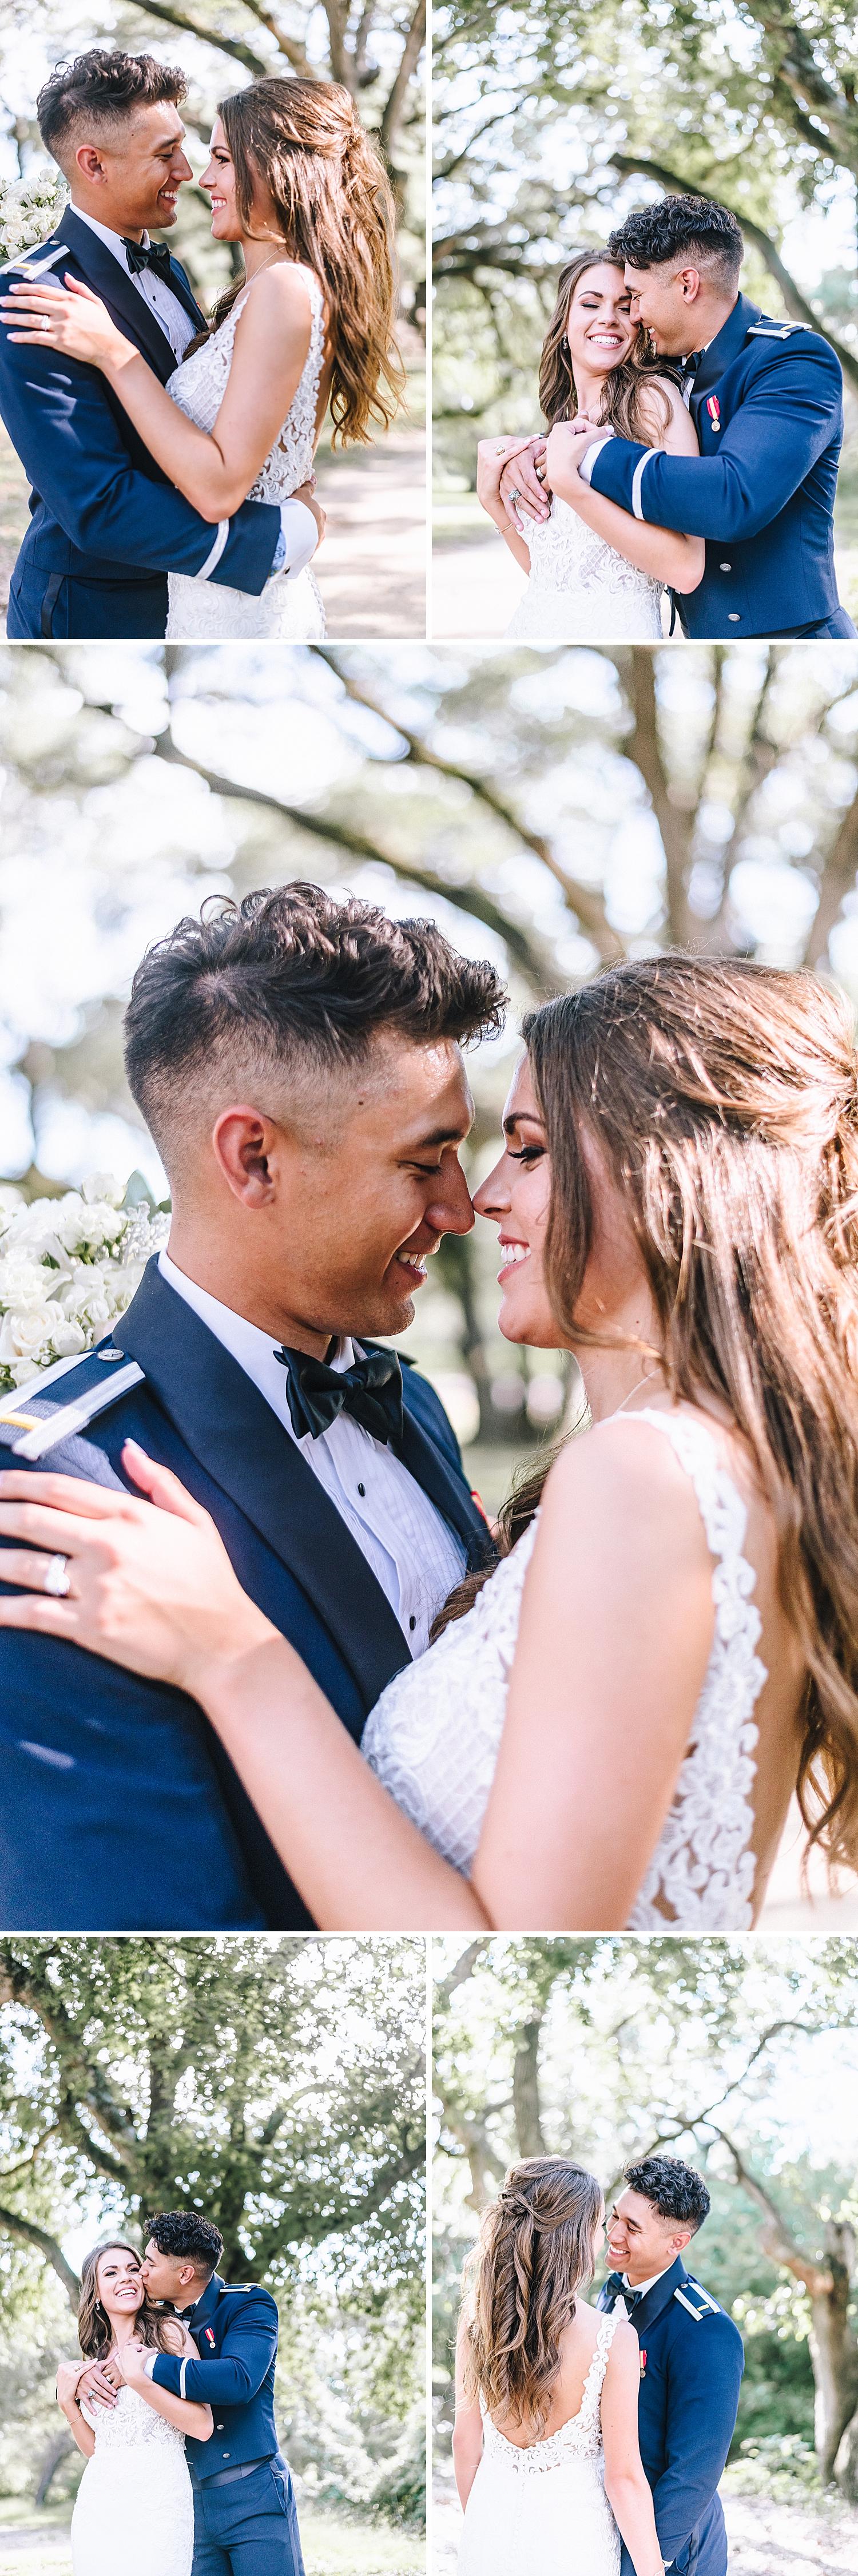 Military-AIr-Force-Wedding-Seguin-LaVernia-Texas-Carly-Barton-Photography_0076.jpg